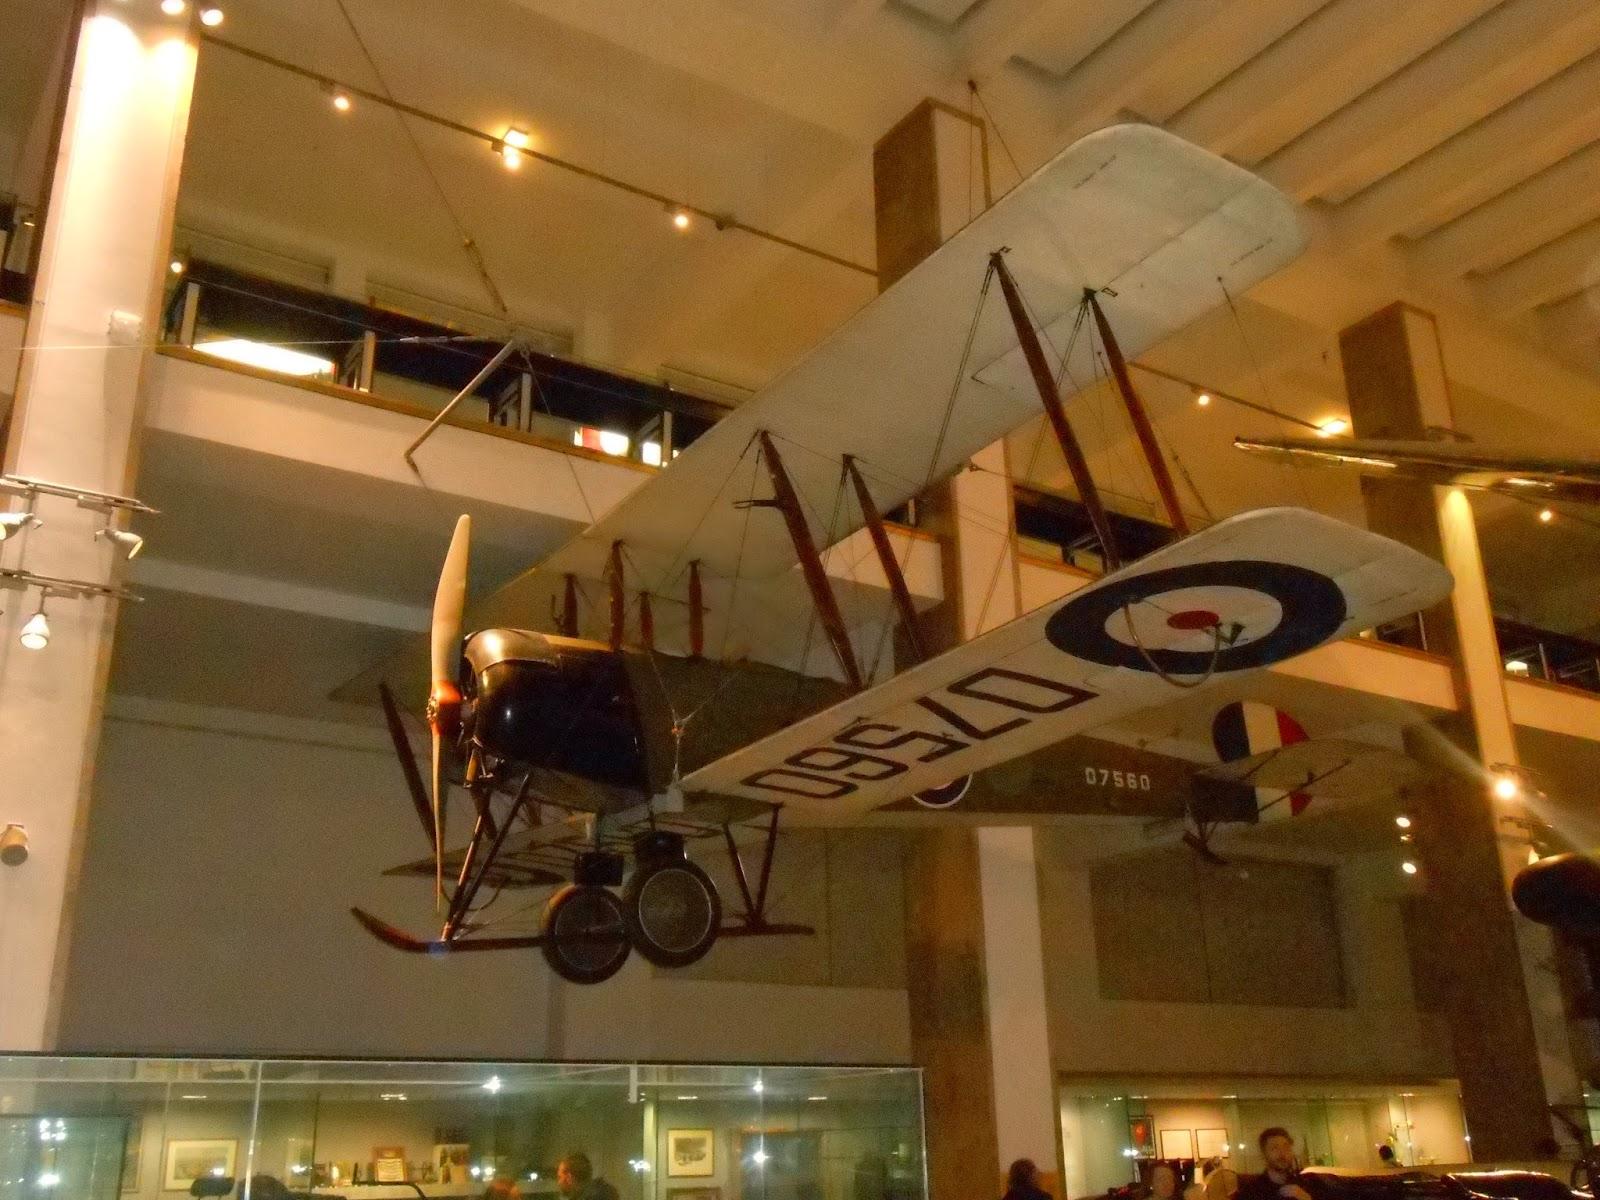 Samolot w Muzeum Nauki.